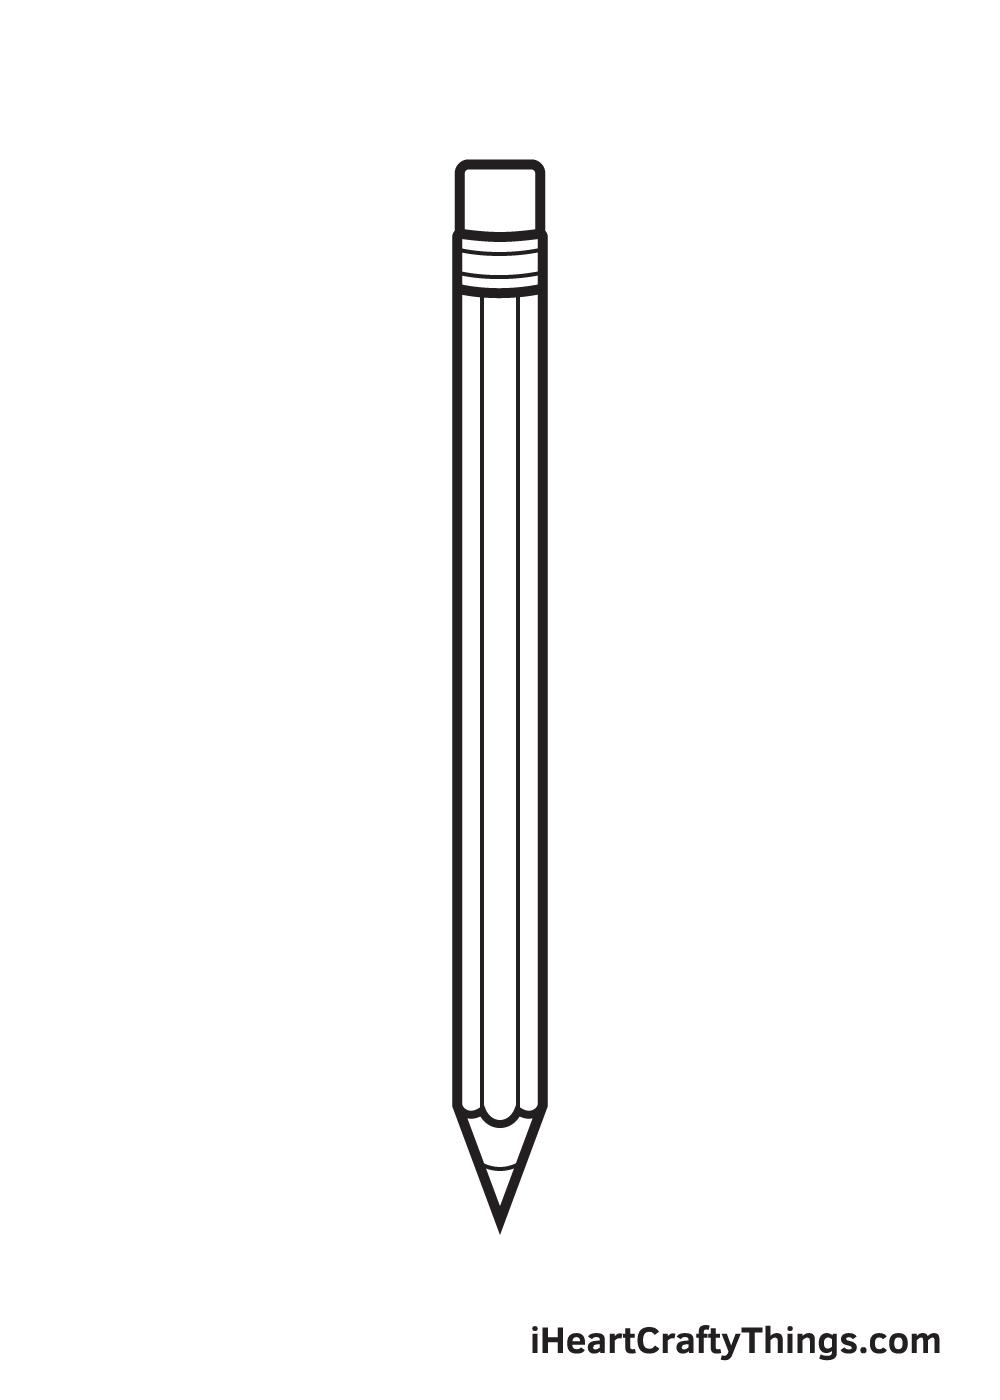 pencil drawing step 9